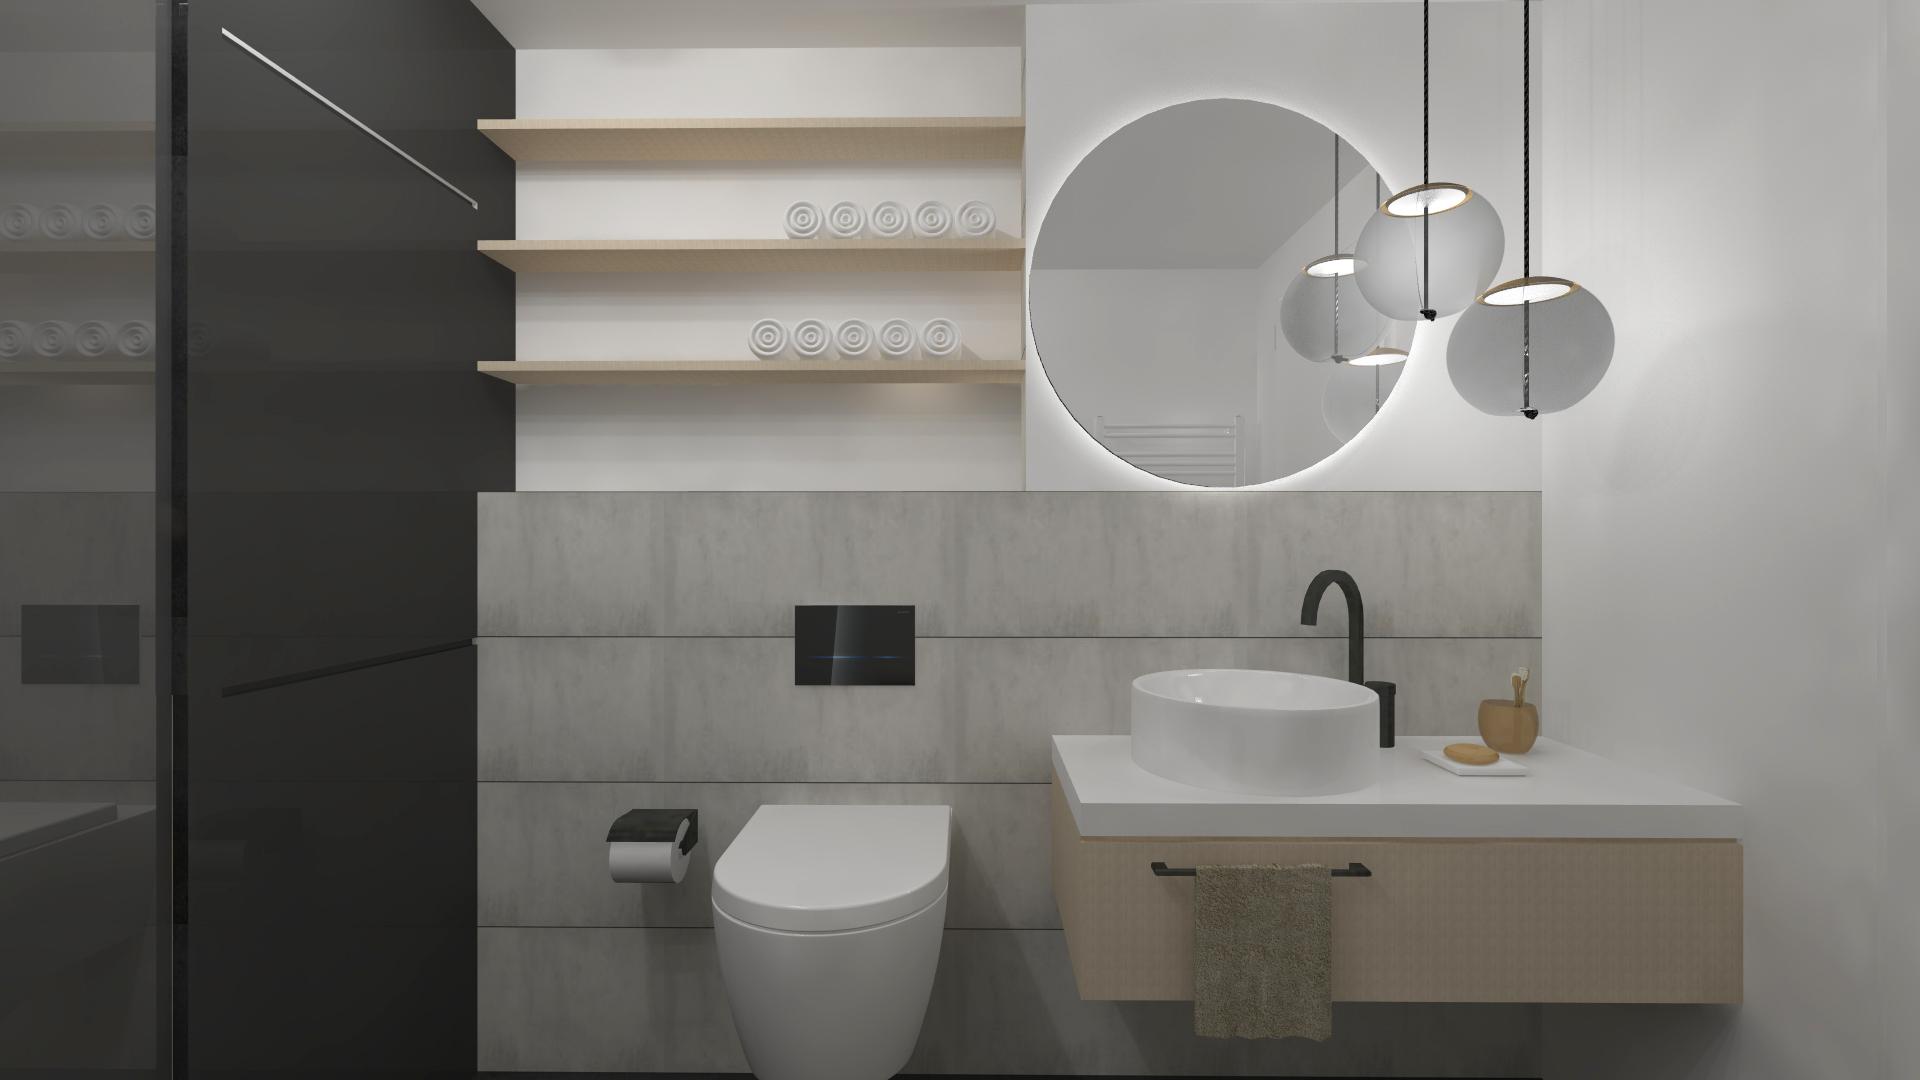 koupelna black pohled na umyvadlo